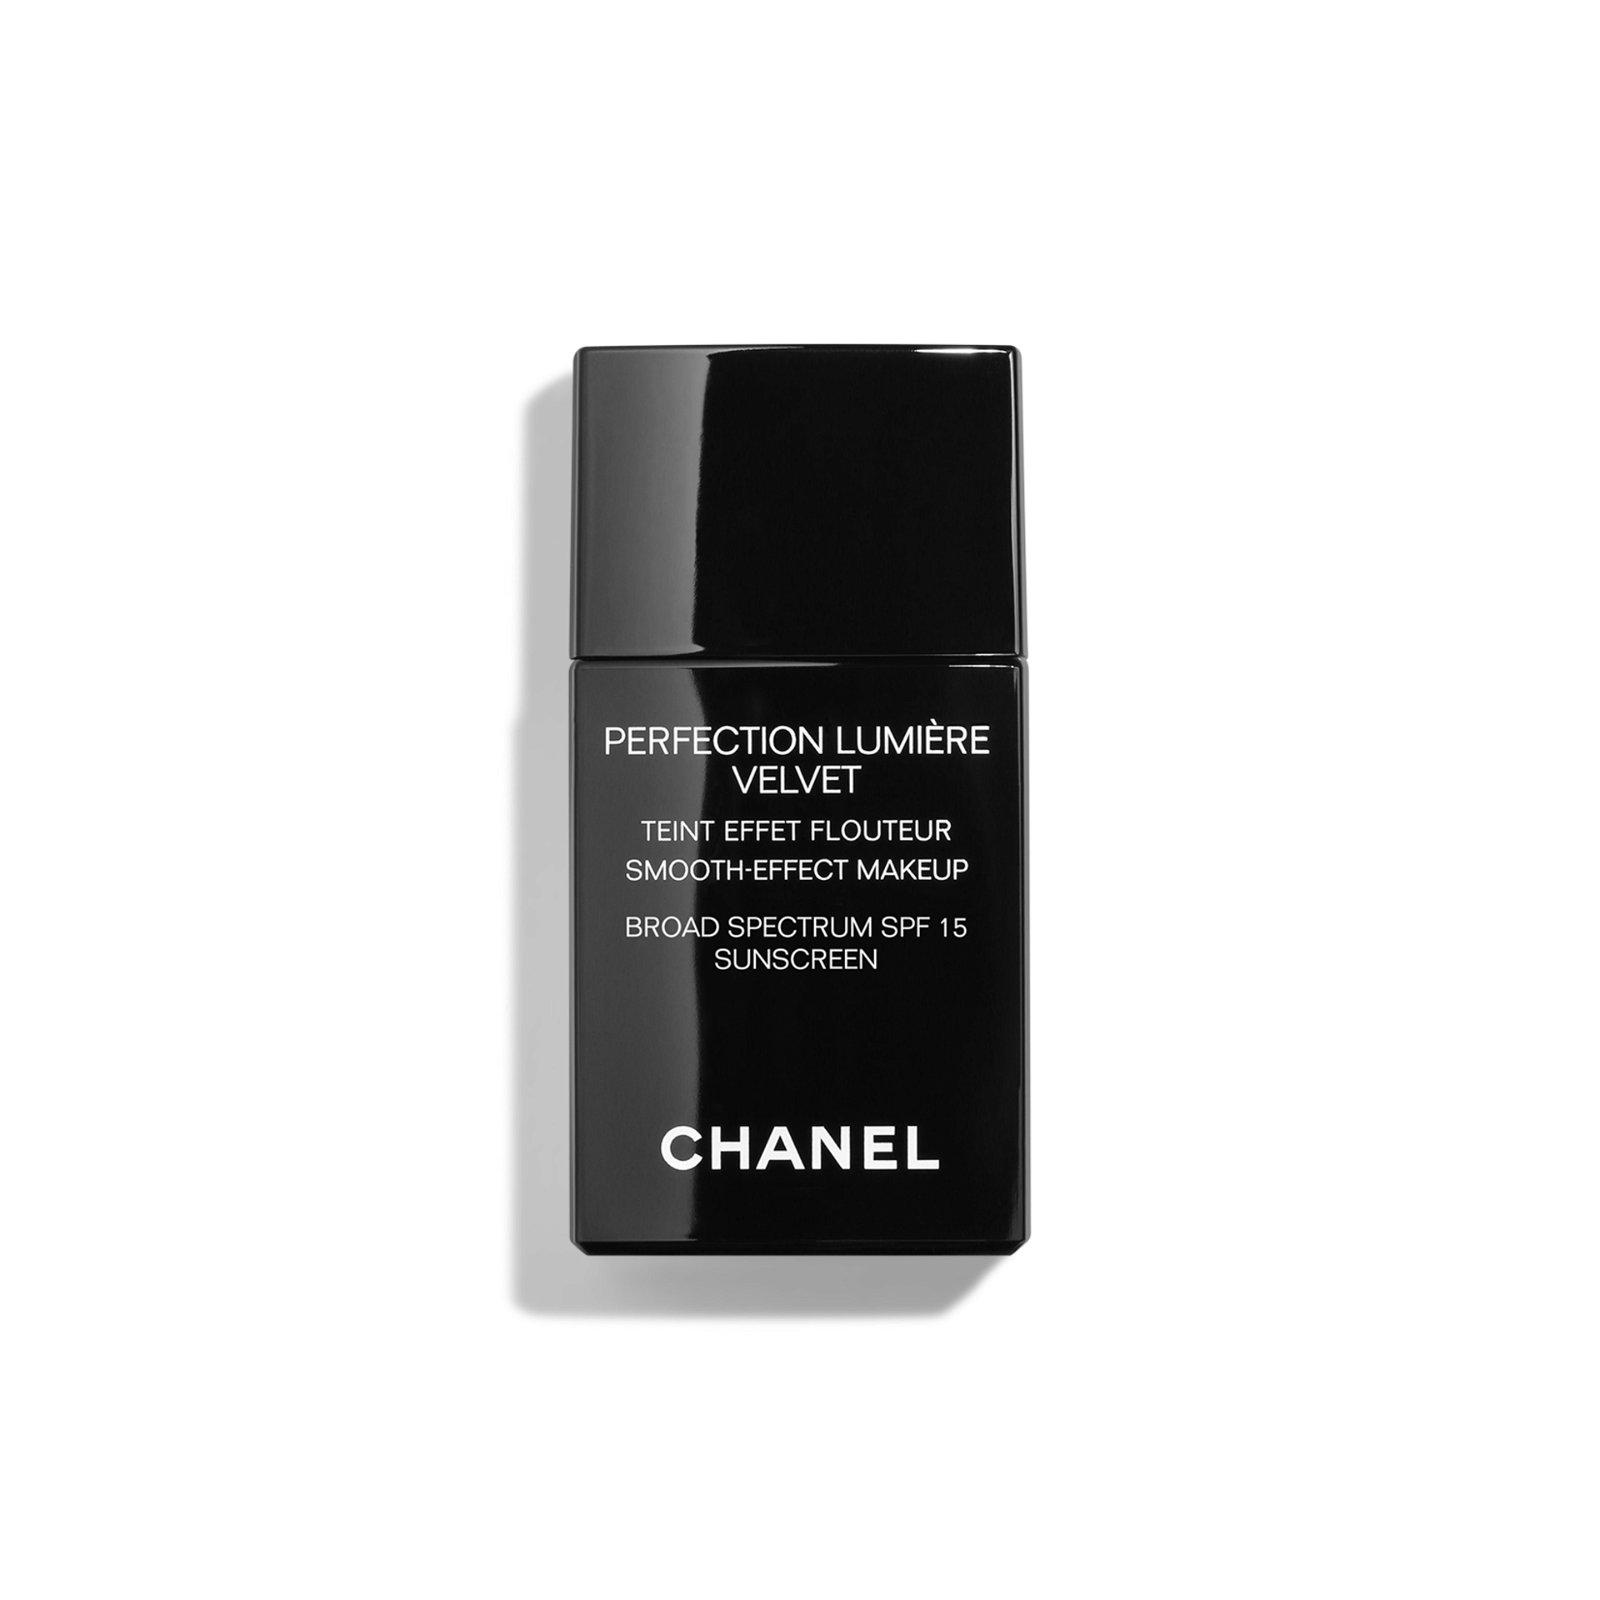 perfection lumiere velvet smooth-effect makeup broad spectrum spf 15 sunscreen